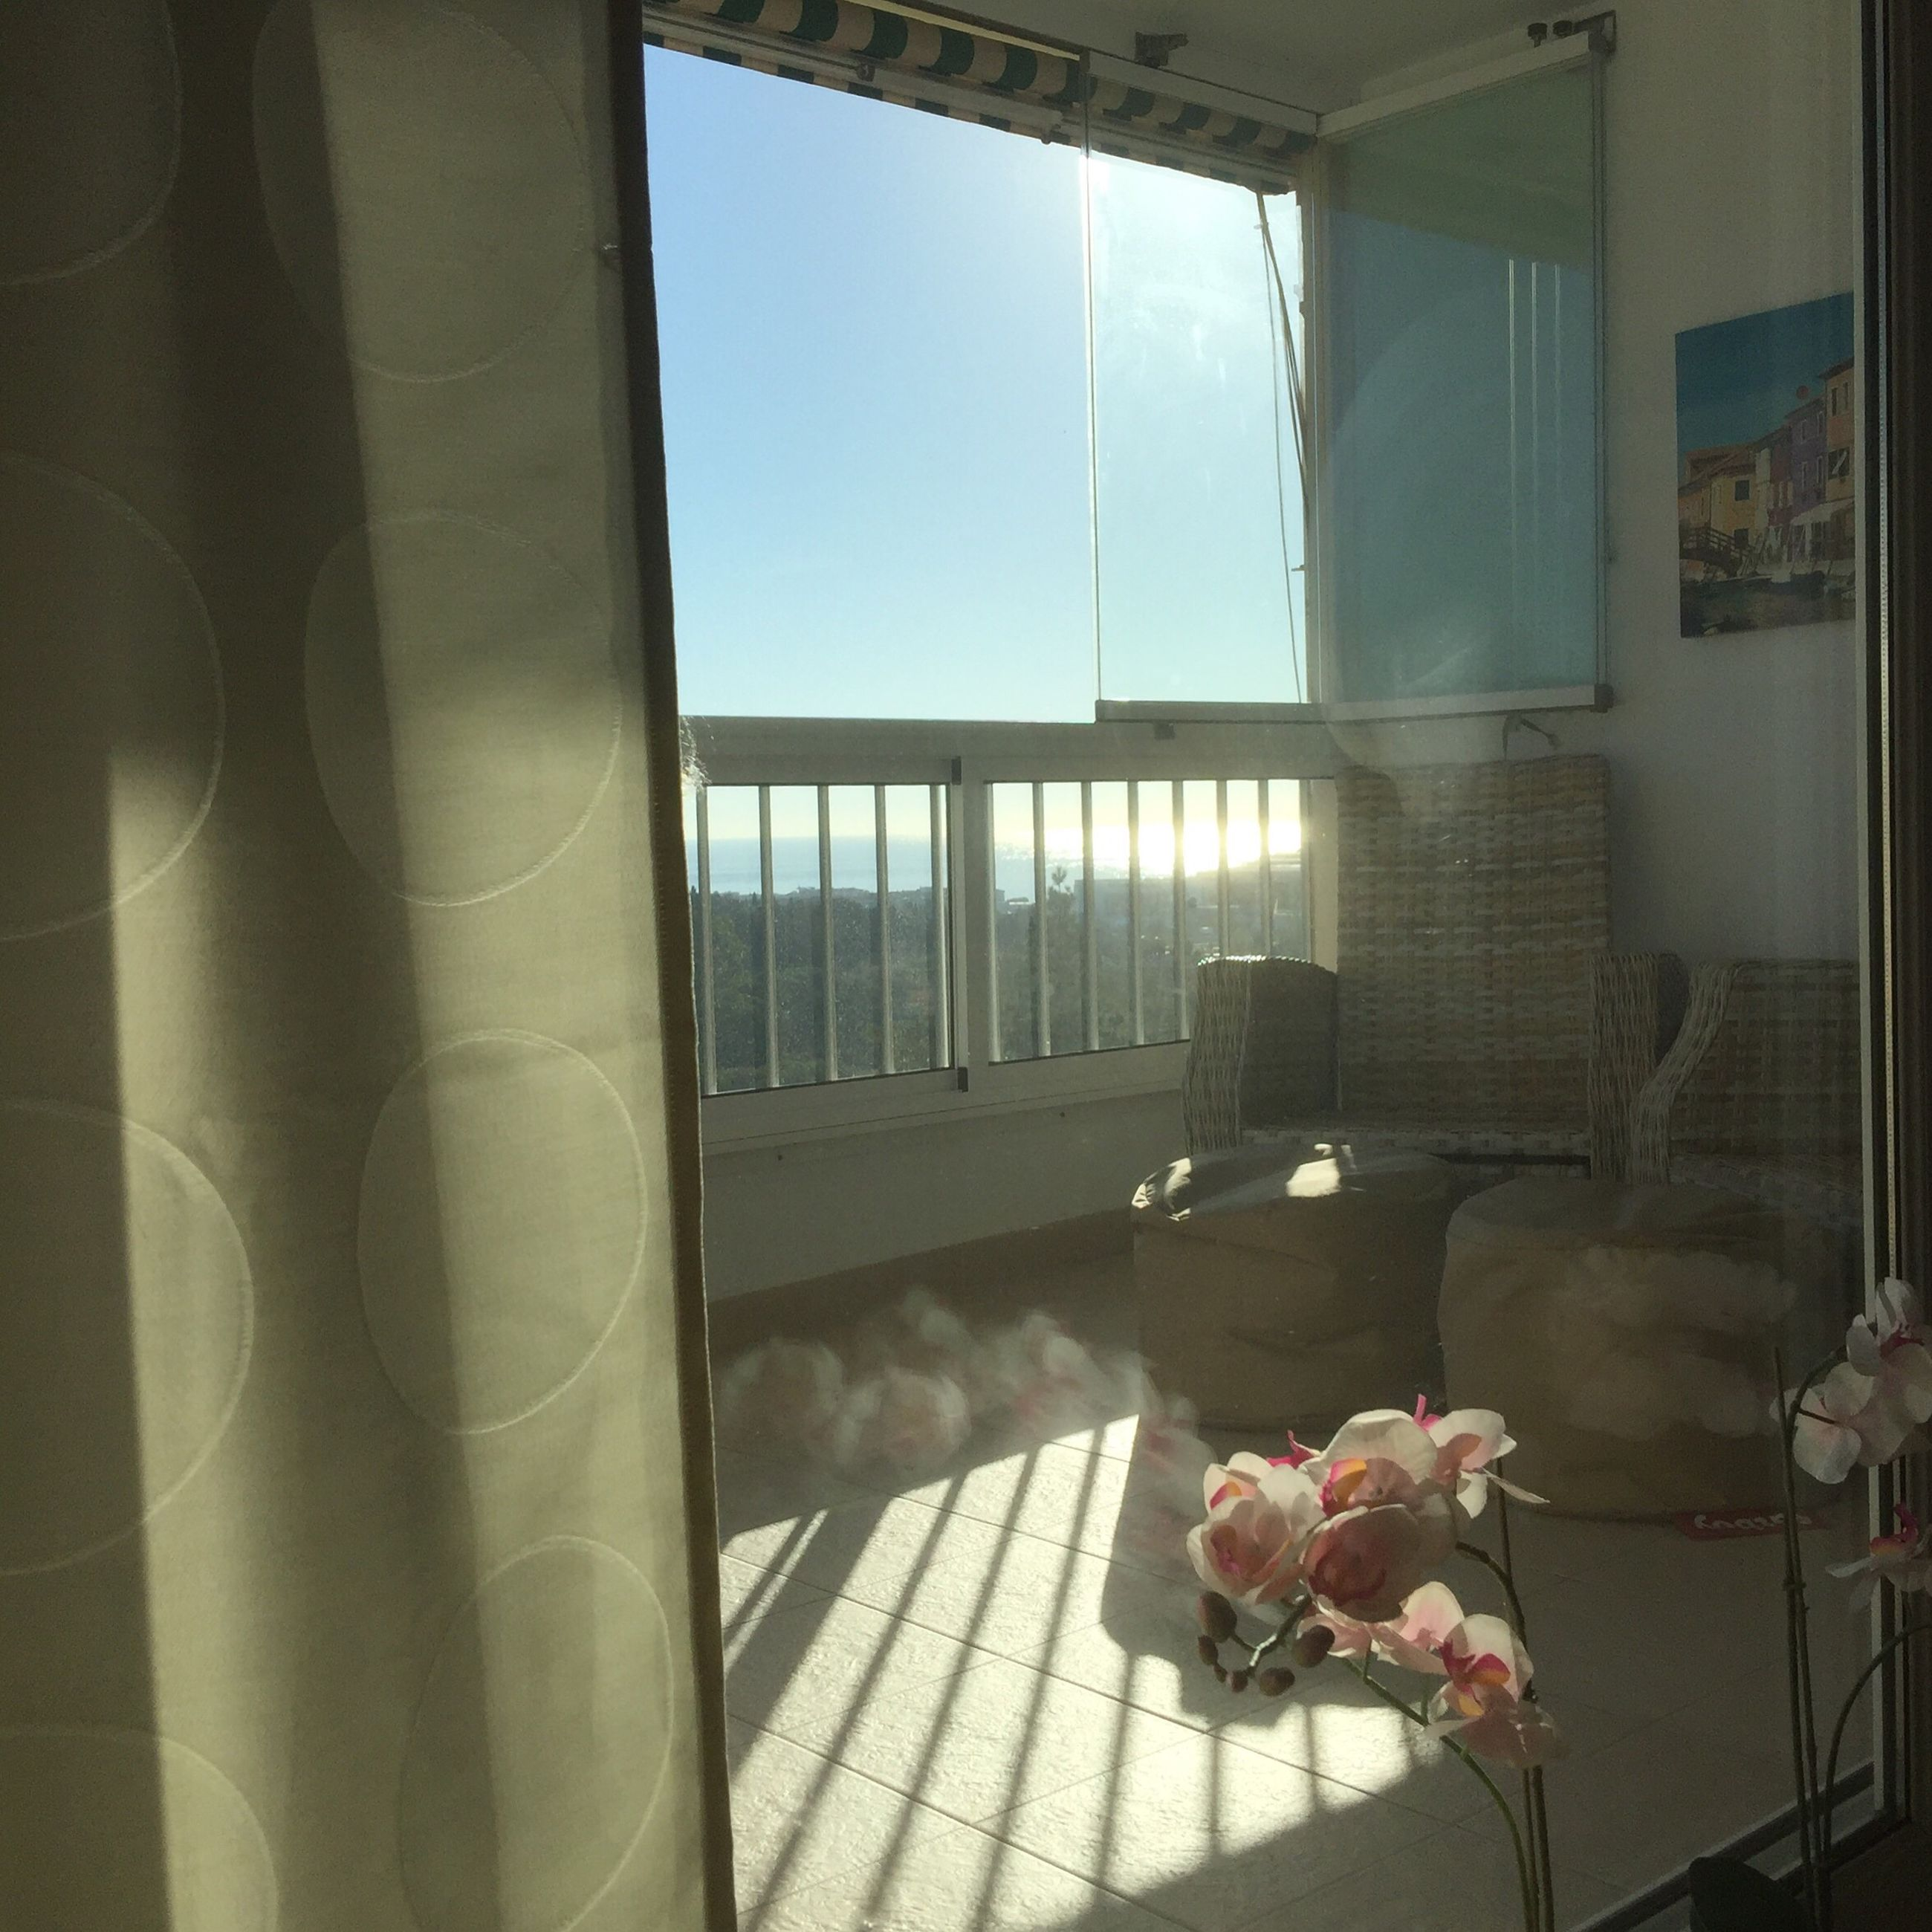 window, indoors, home interior, flower, chair, freshness, curtain, day, sea, fragility, nature, tourist resort, window frame